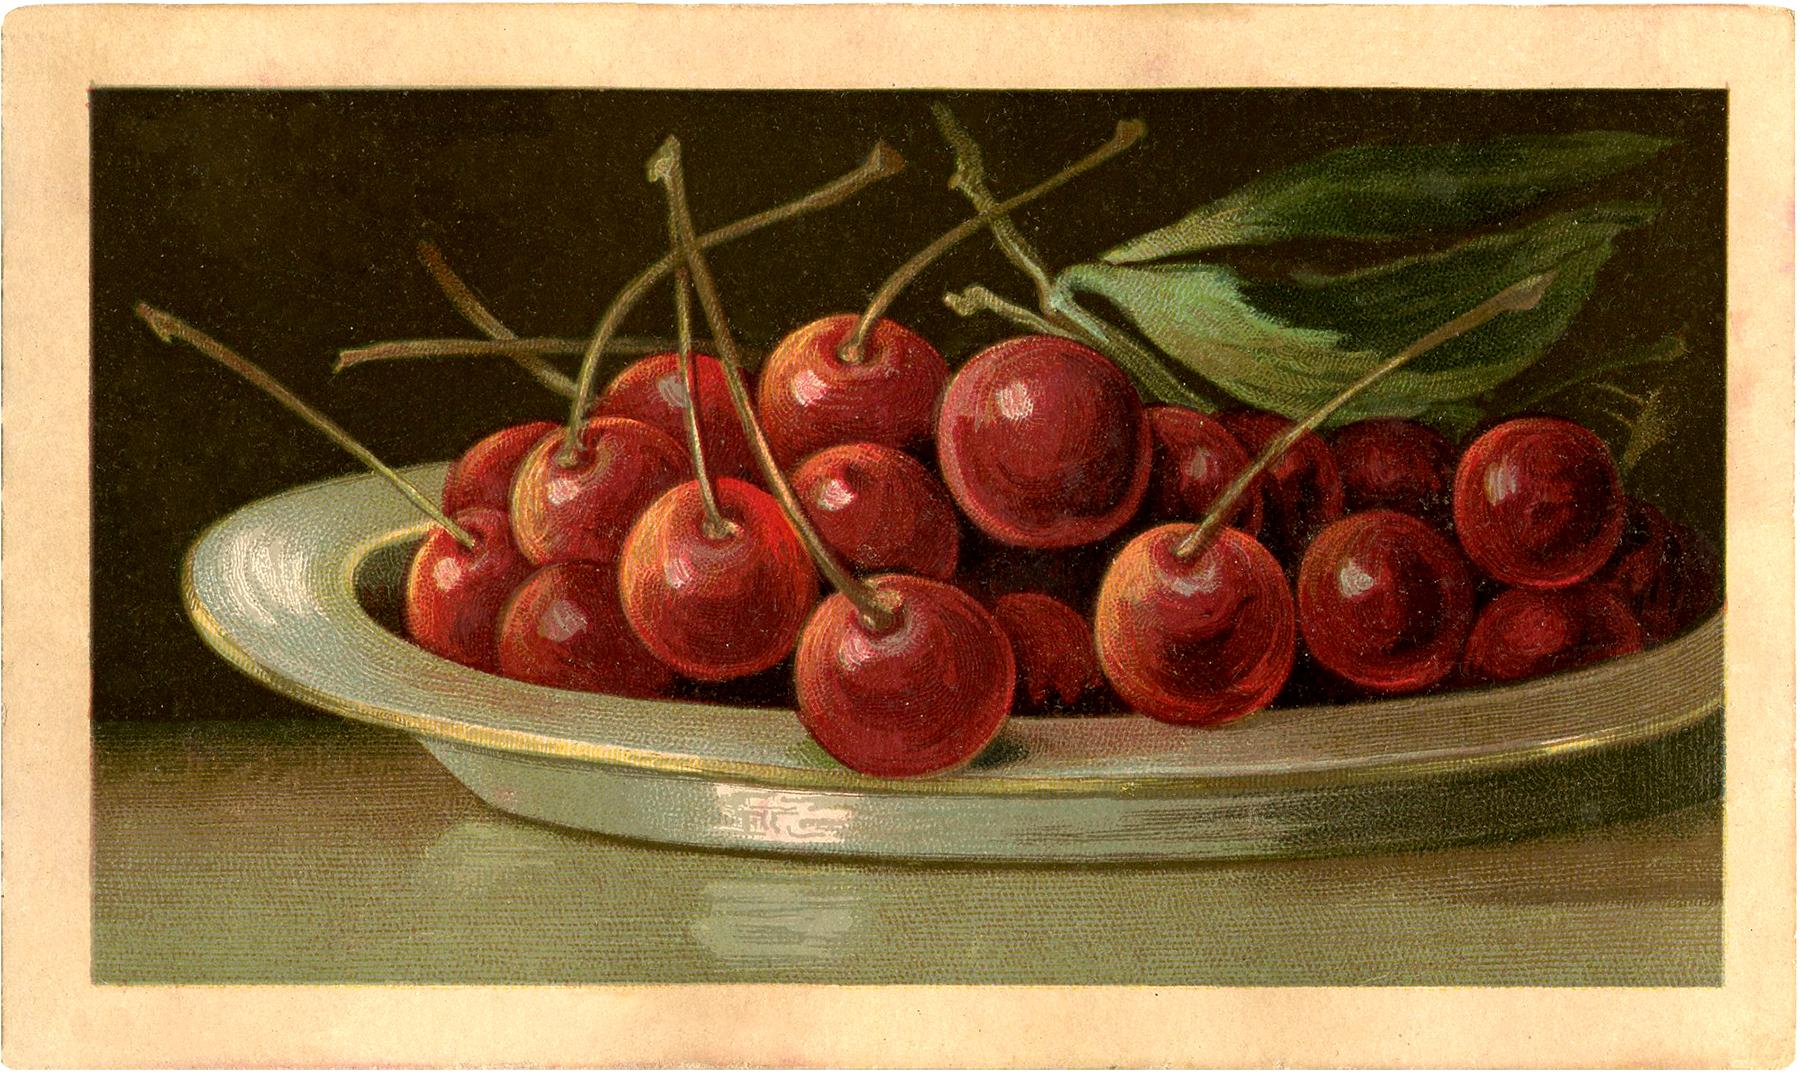 Cherries clipart bowl. Full of image beautiful